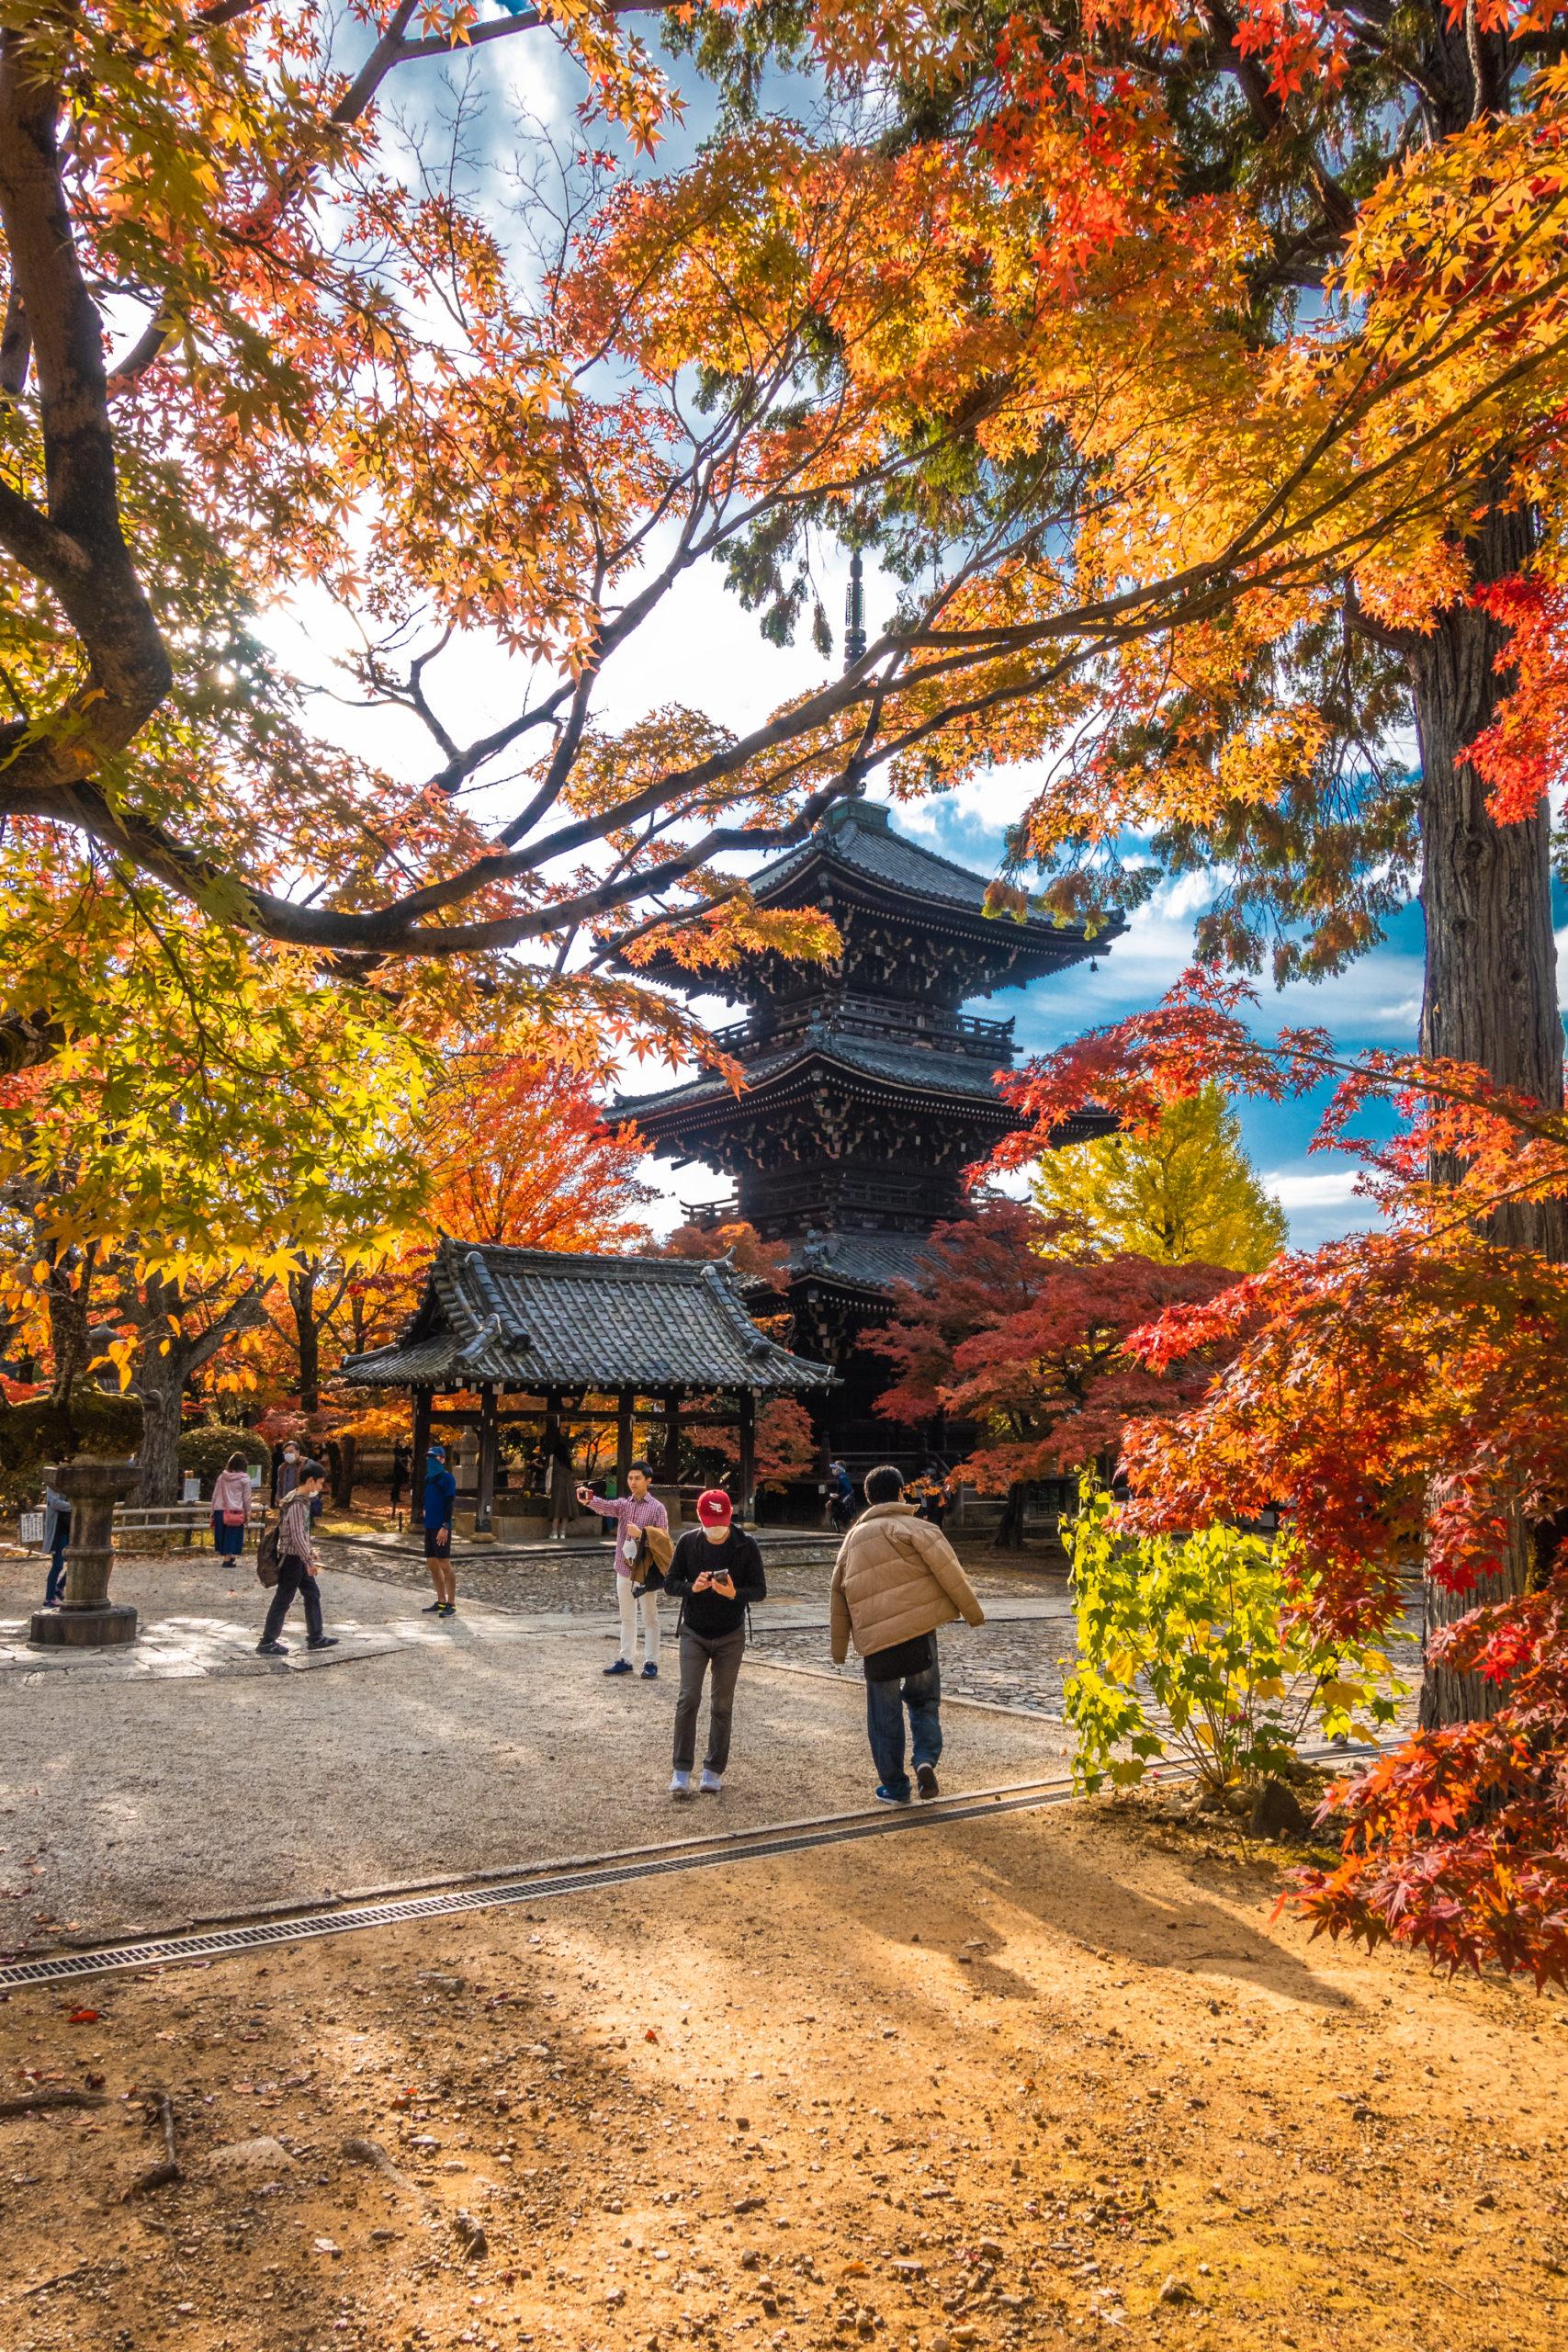 DSC00760-scaled 京都  真如堂(三重塔と紅葉の風情を感じる景色が美しい秋におすすめのスポット!撮影した写真の紹介、アクセス情報など)